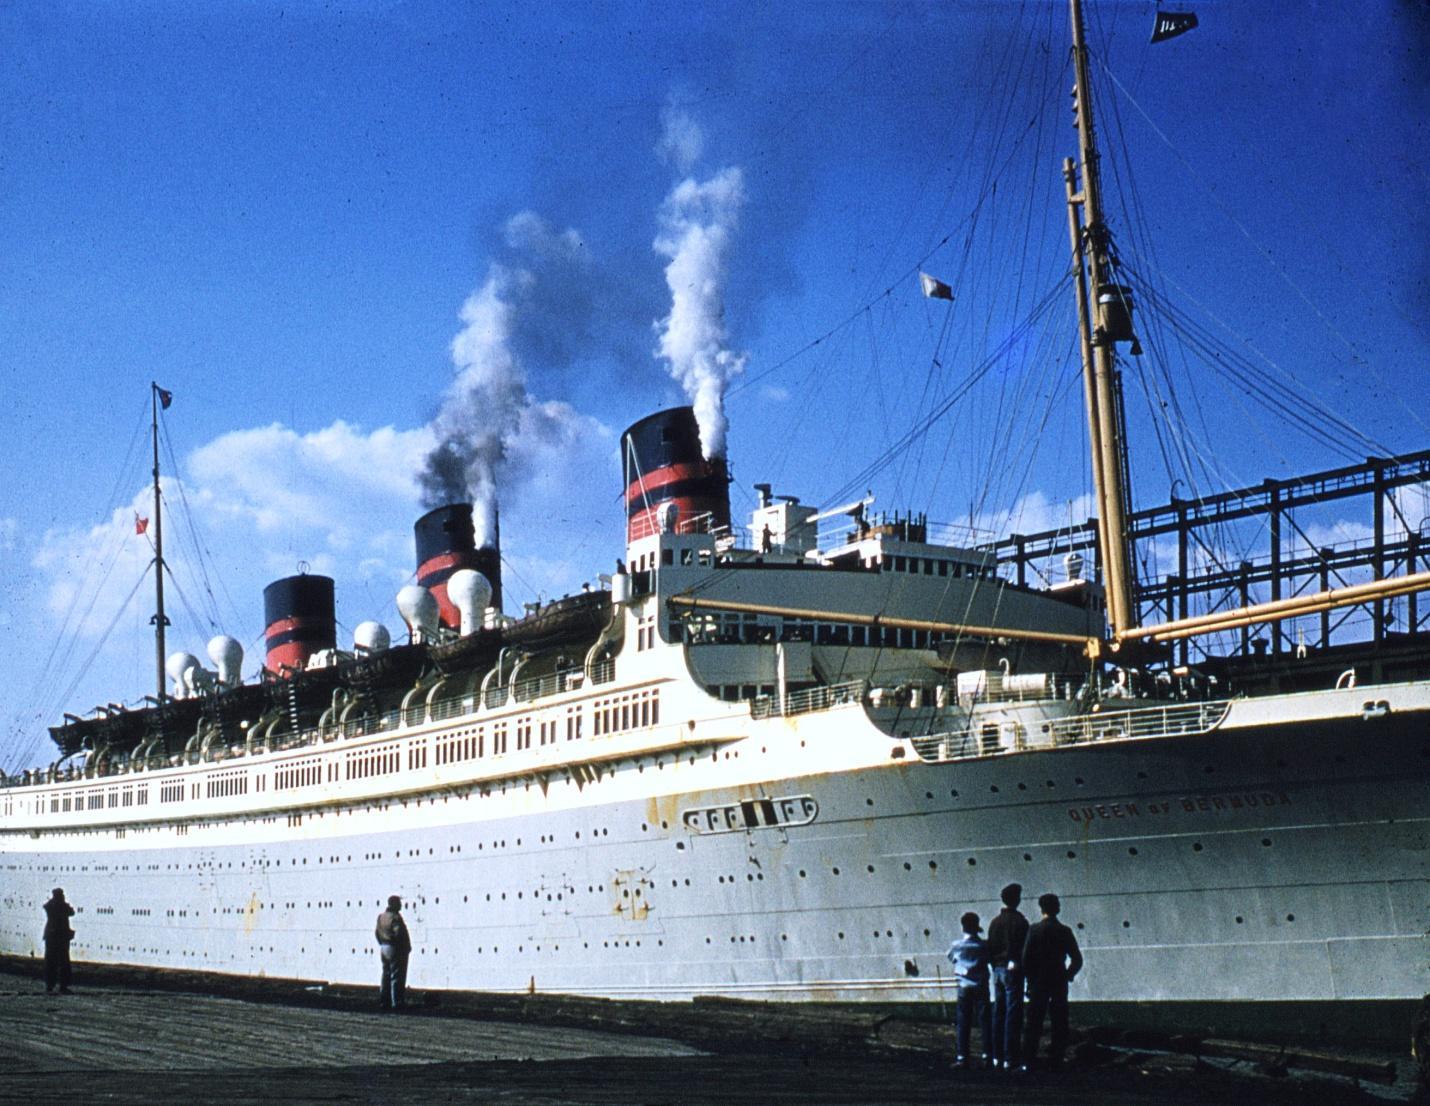 D:\Bill\Pictures\Blue Water color\Blue Water color\New York Harbor Queen of Bermuda.jpg